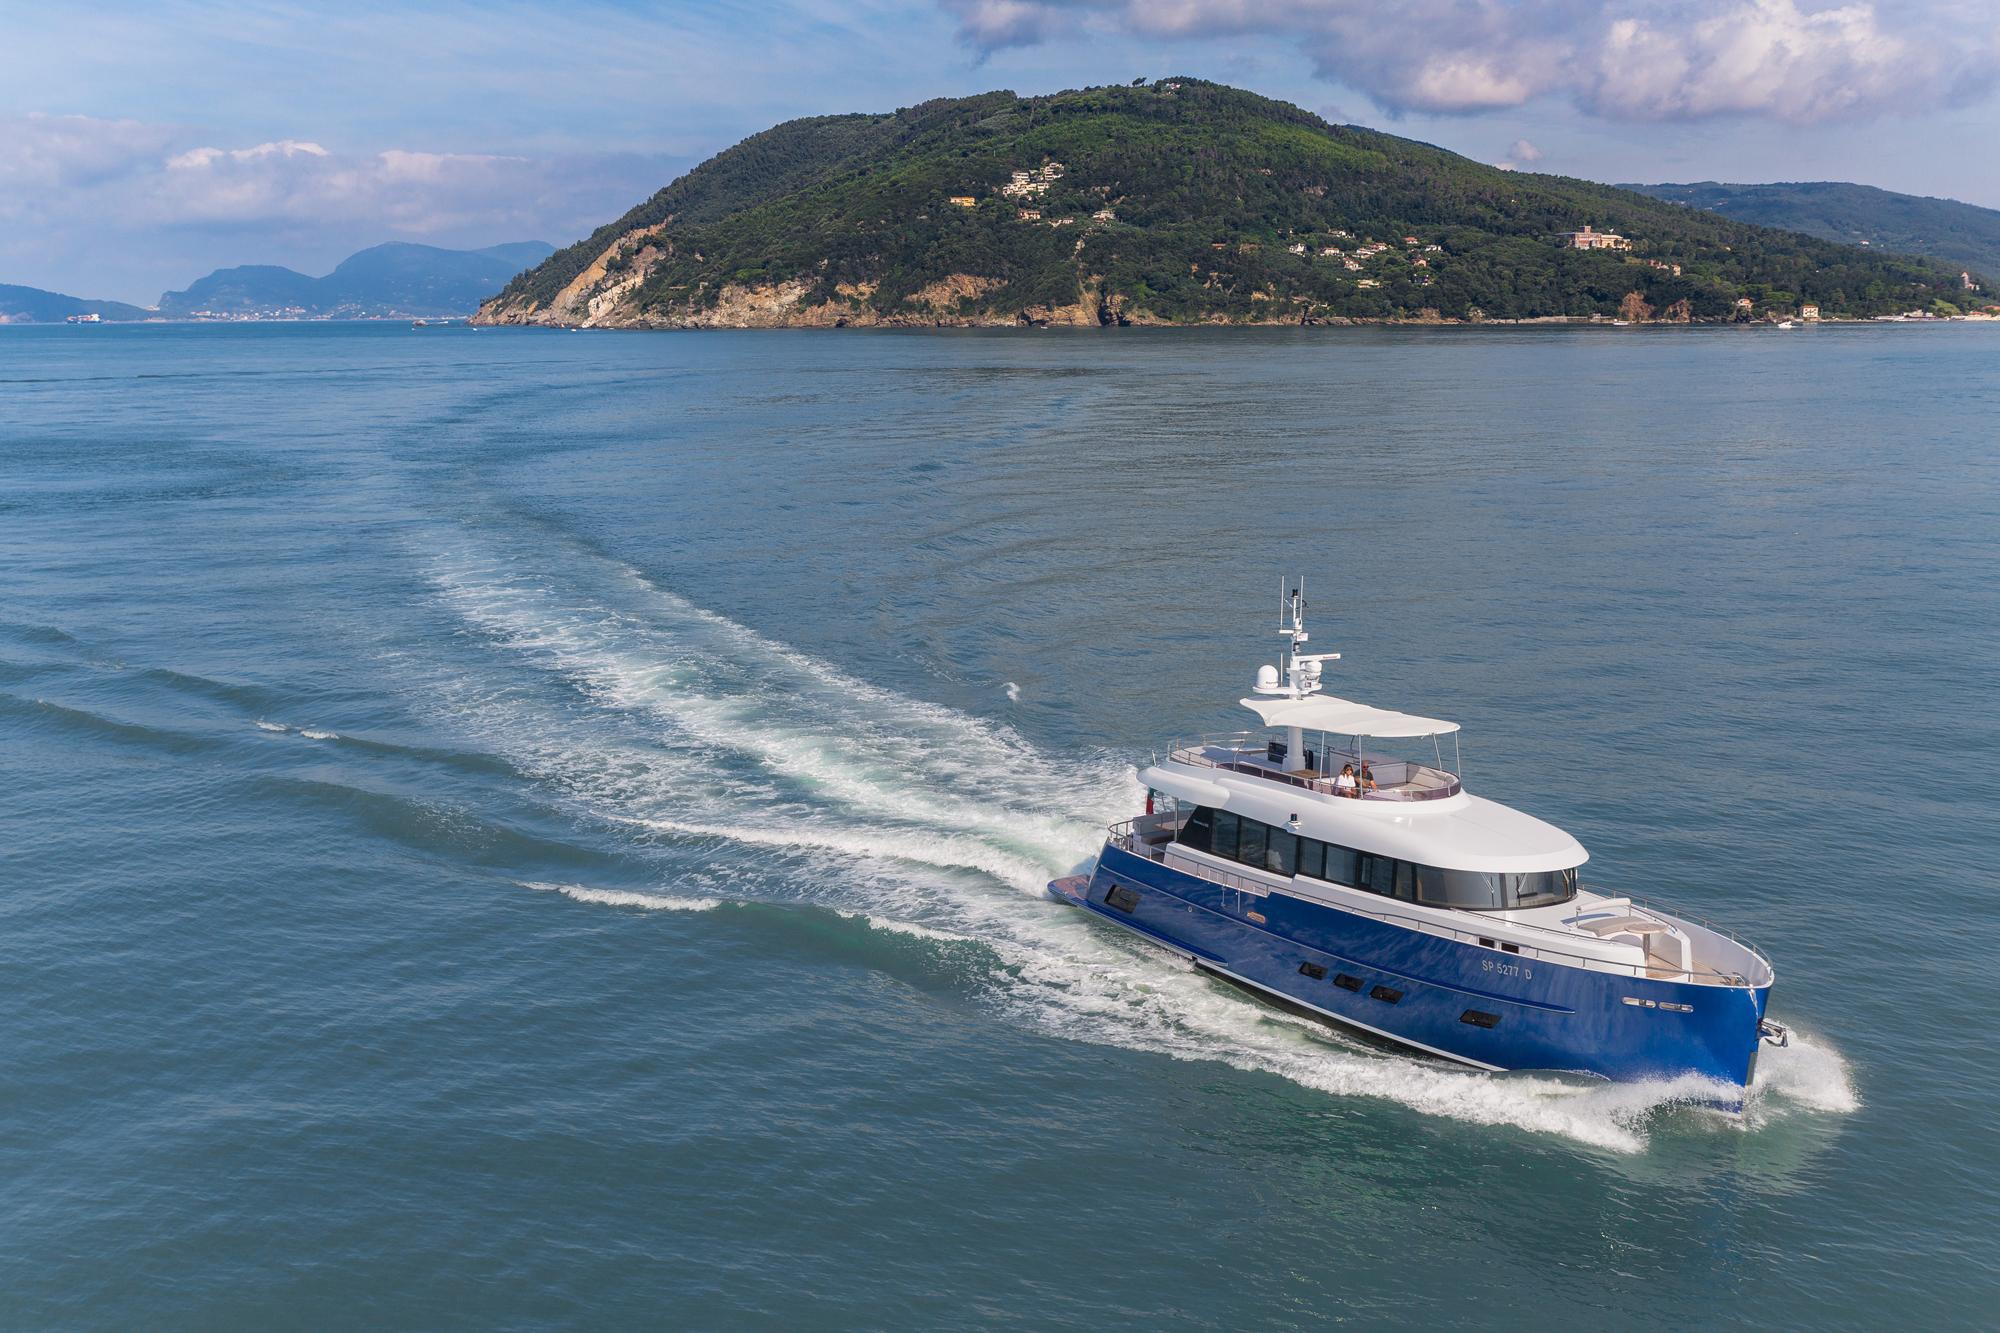 Gamma 20 - MY Libertas - Andrea Bocelli trawler yacht